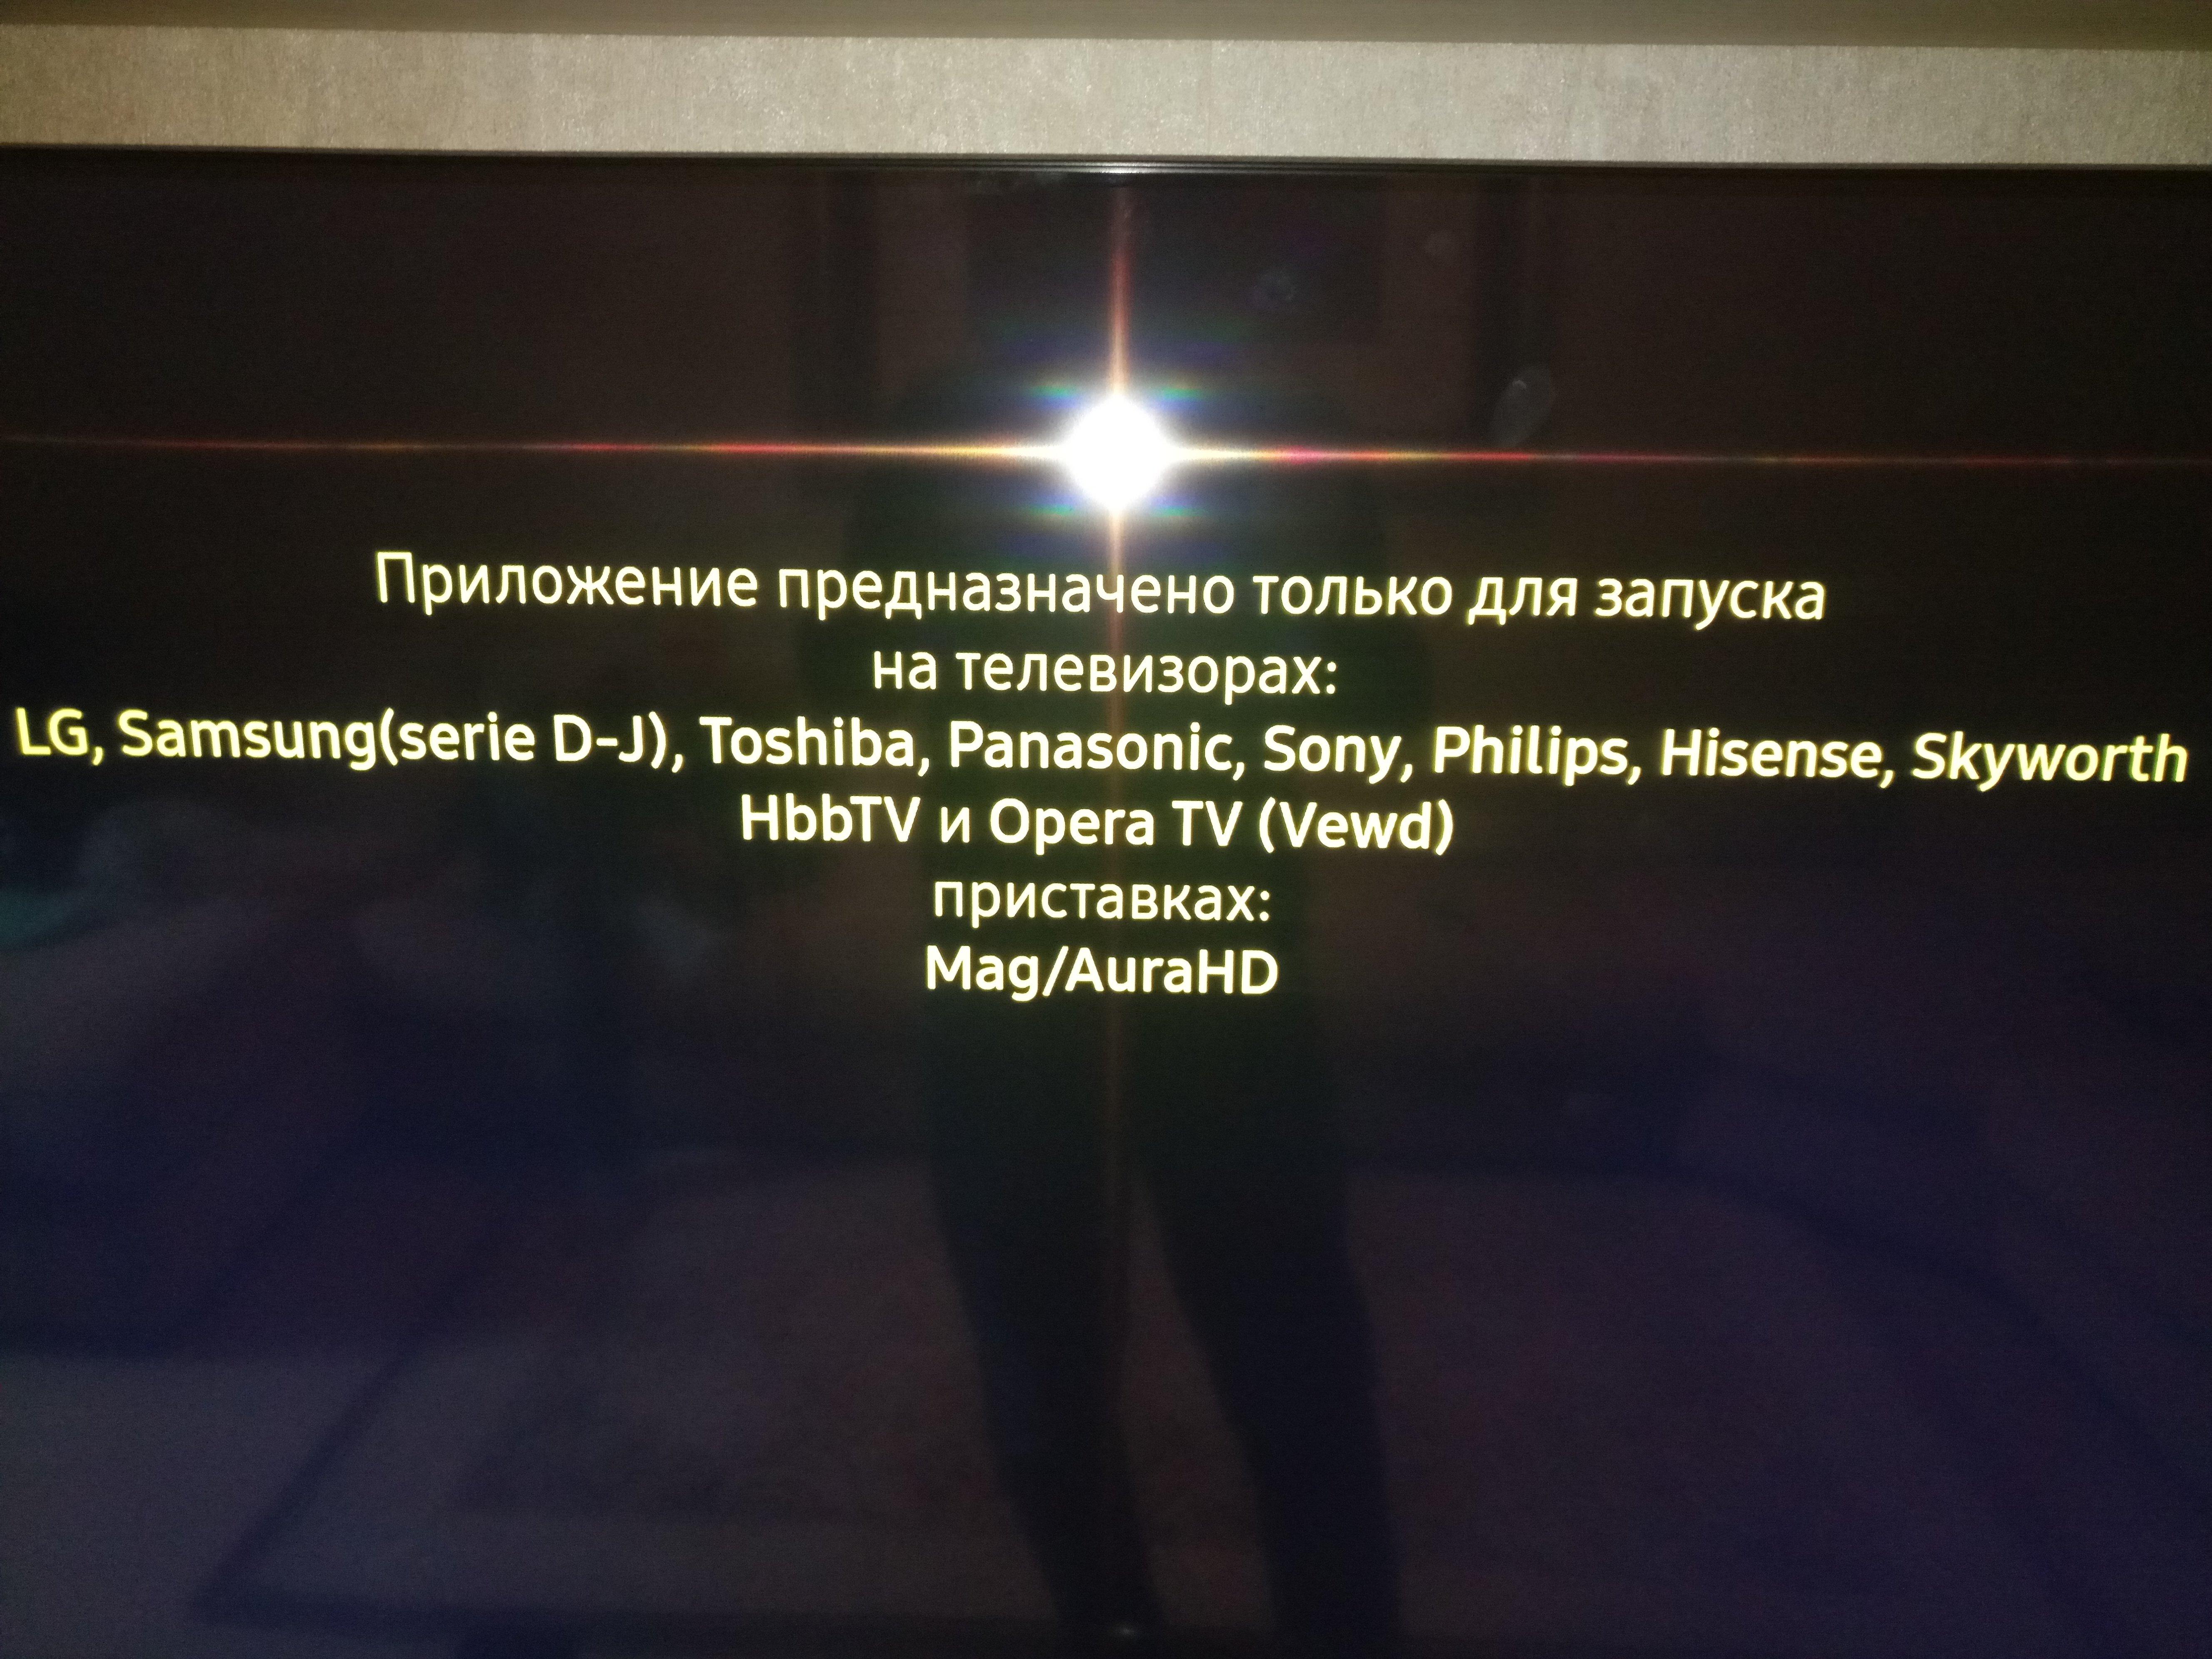 Ott-play плеер для телевизоров Samsung - Страница 3 - IPTV